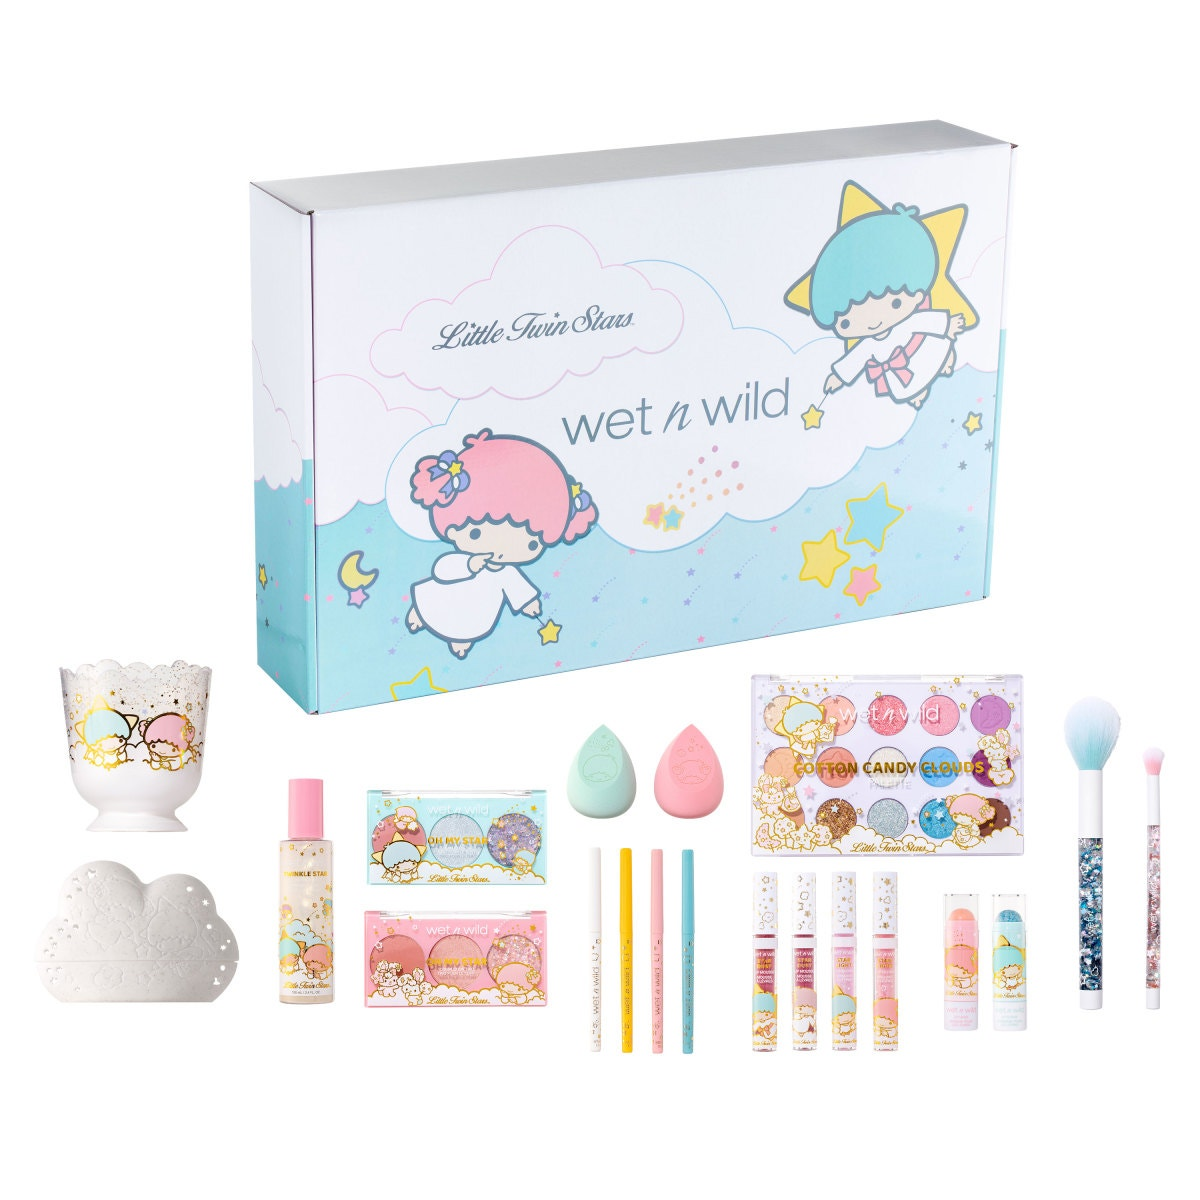 Wet n Wild x Little Twin Stars Collaboration